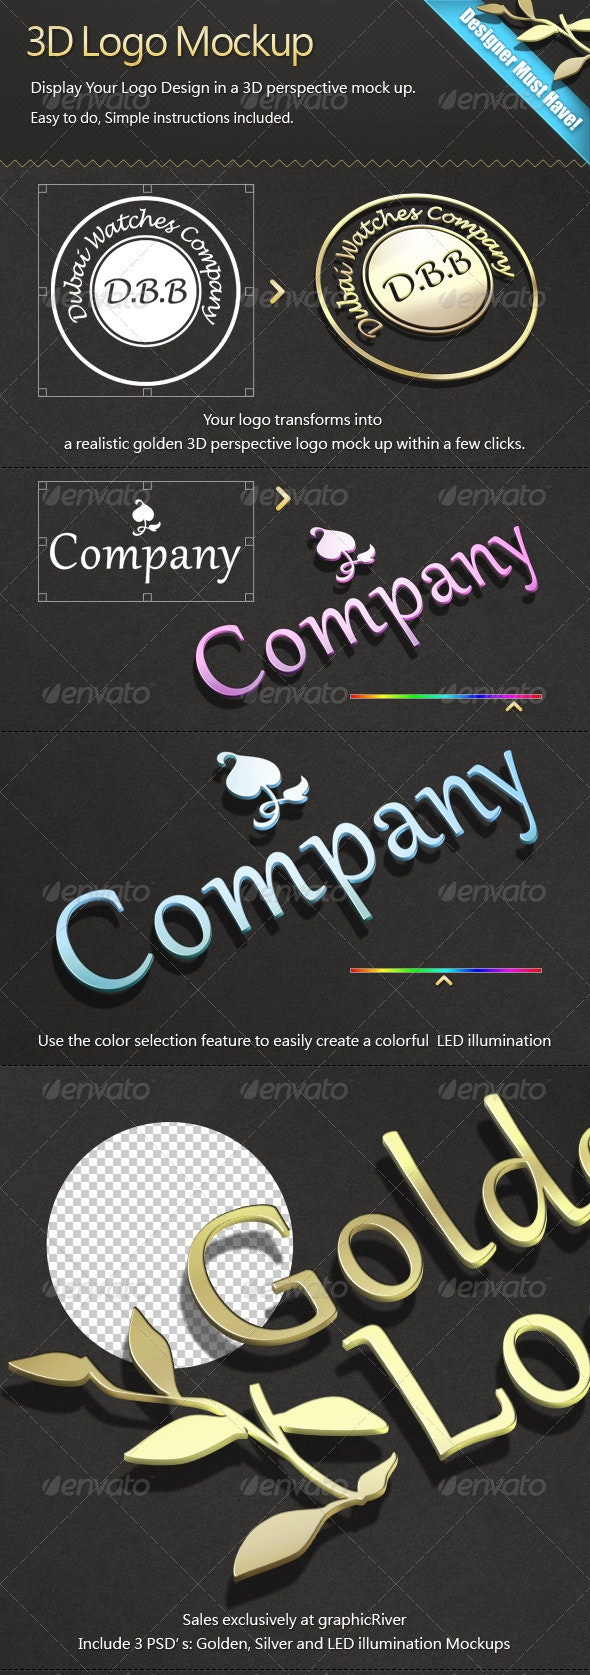 3D Logo Mock-ups Pack - Logo Product Mock-Ups